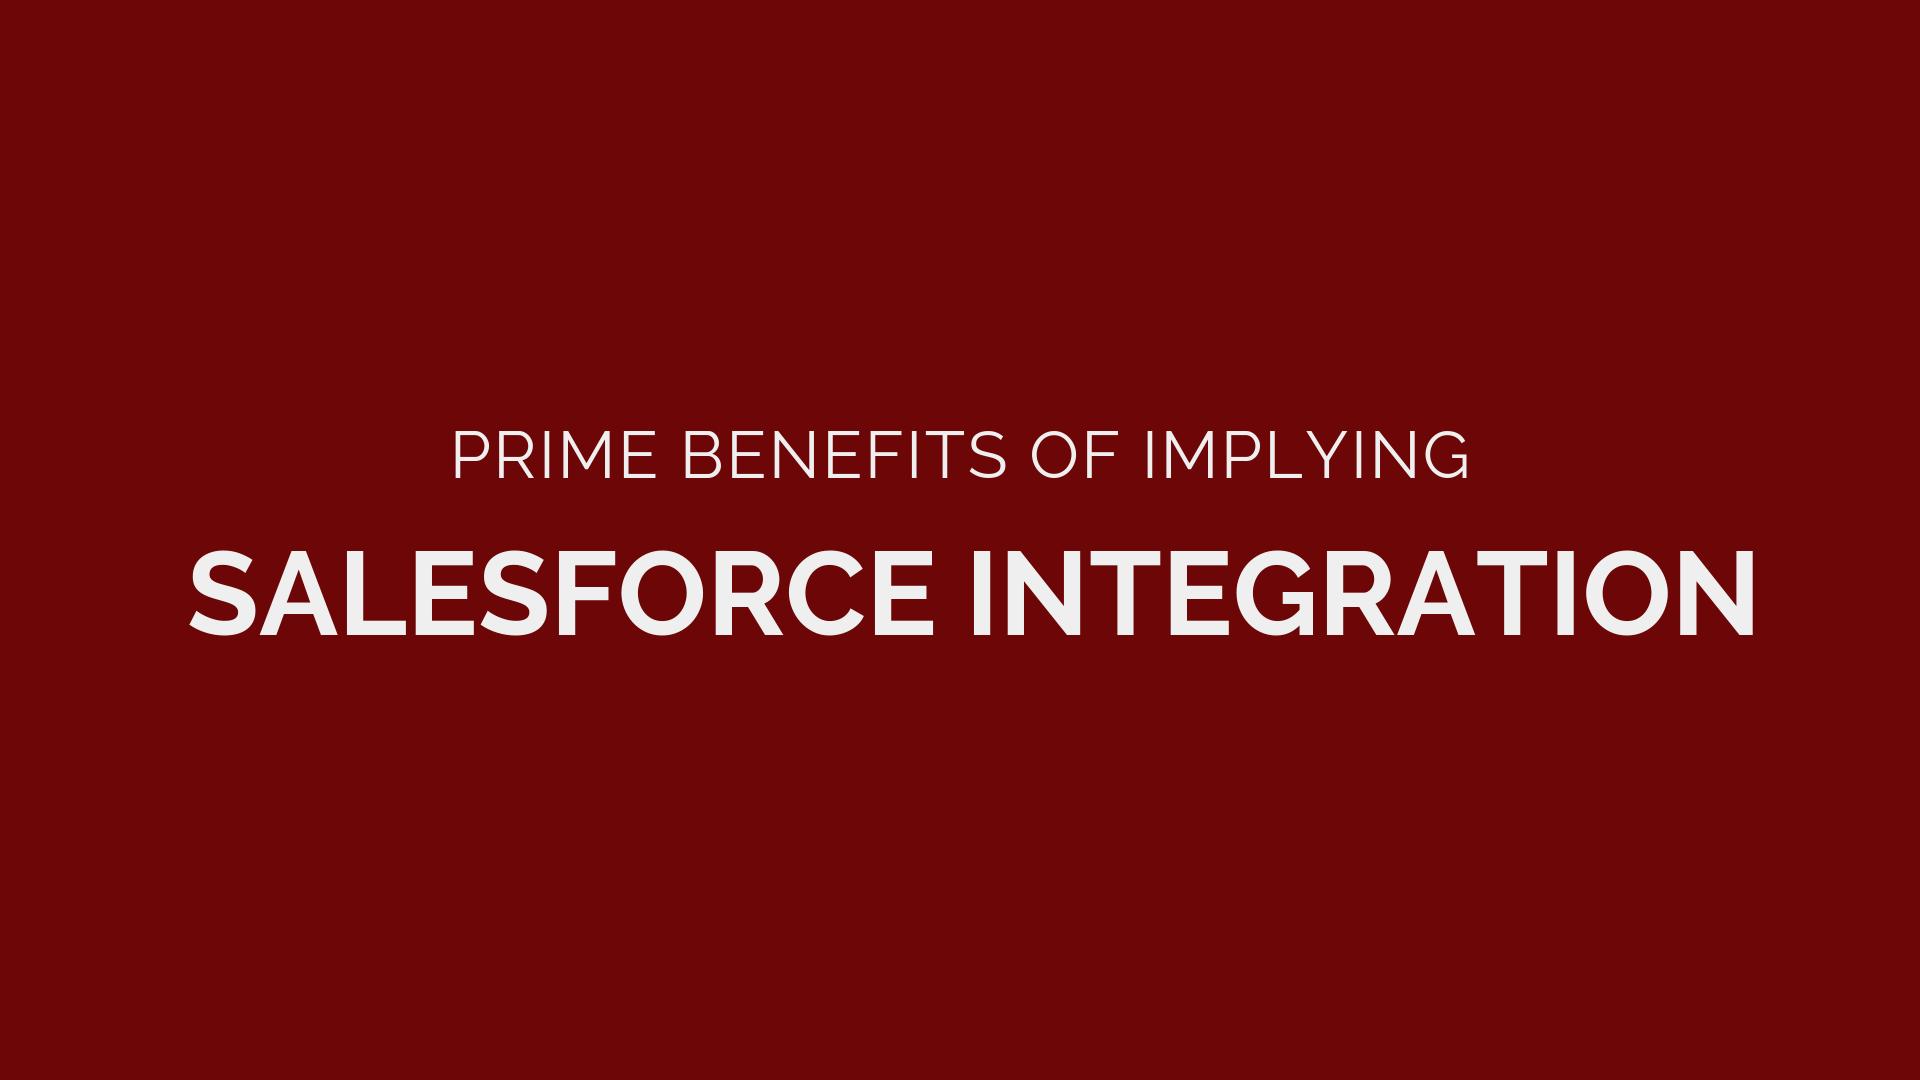 Prime Benefits of Implying Salesforce Integration